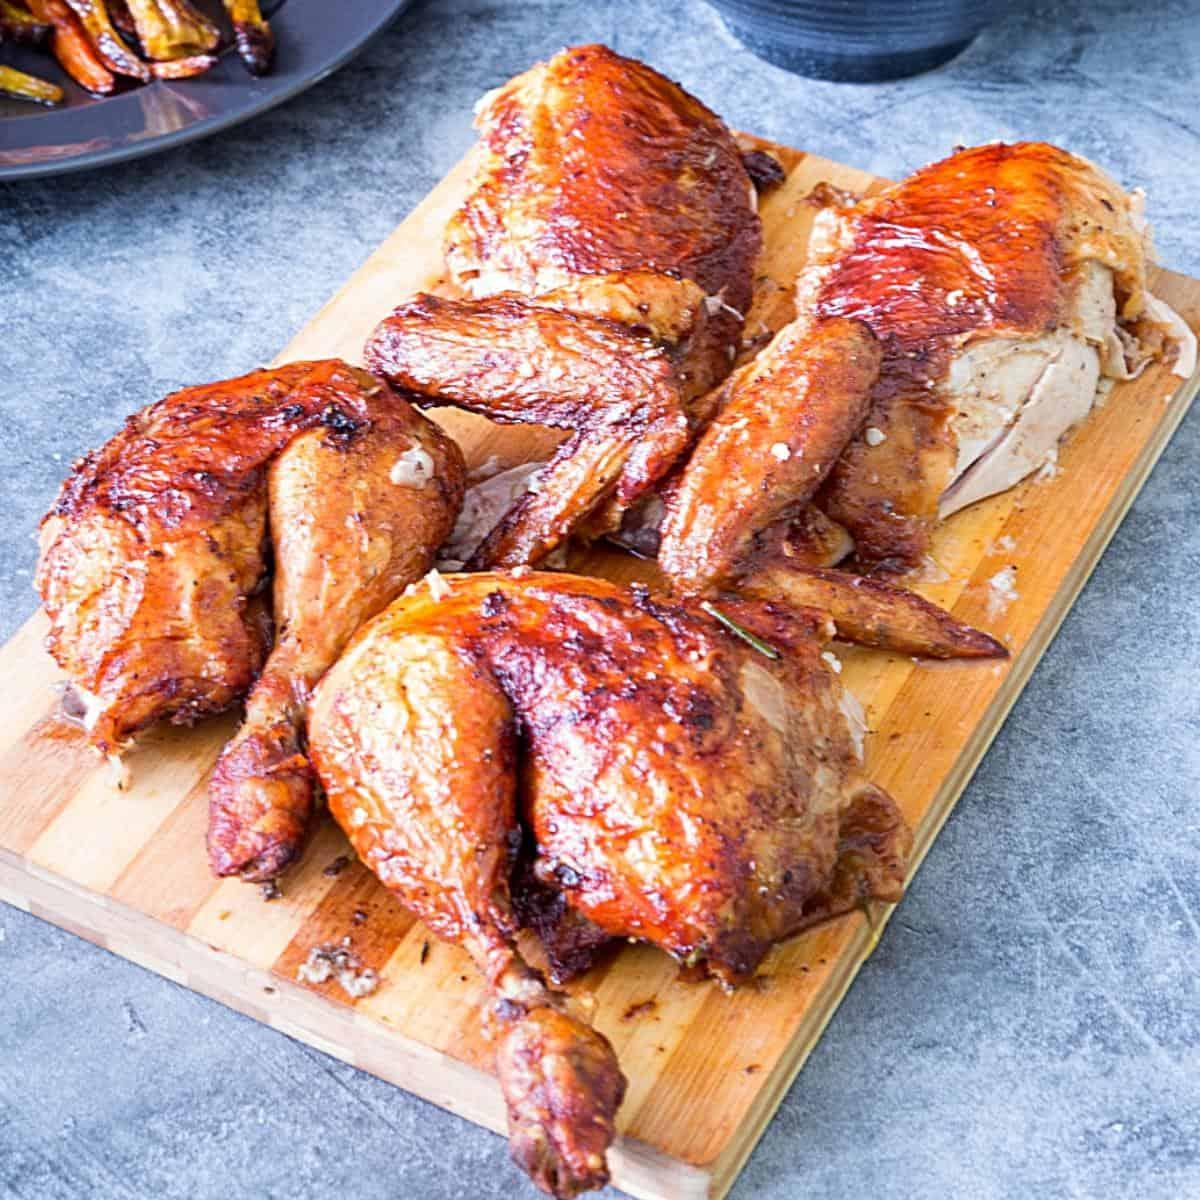 A cut roasted chicken on a wooden board.